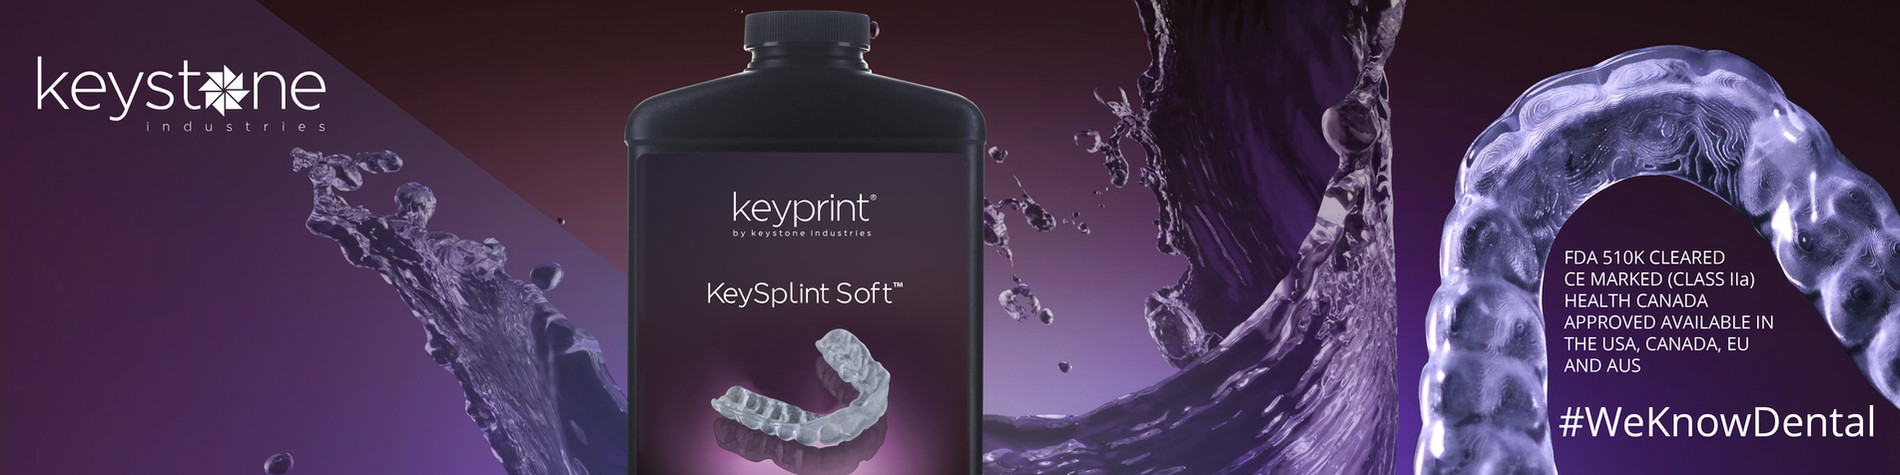 Keystone Keyprint banner